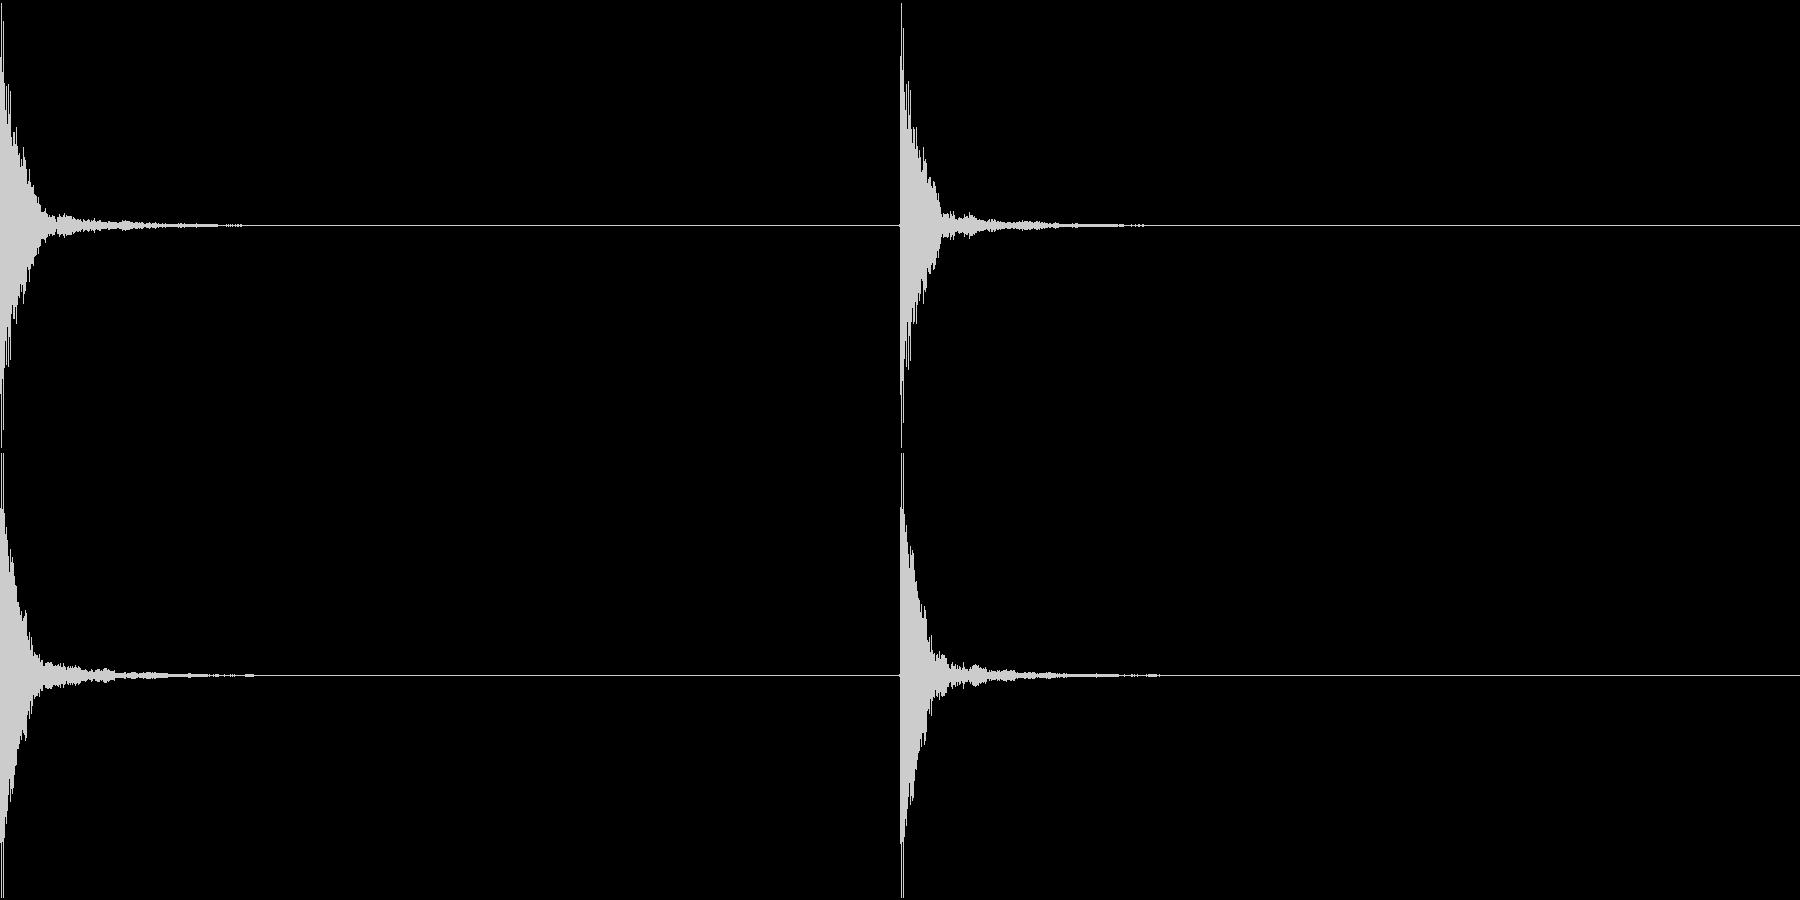 Japan 鼓の音 和楽器 3の未再生の波形